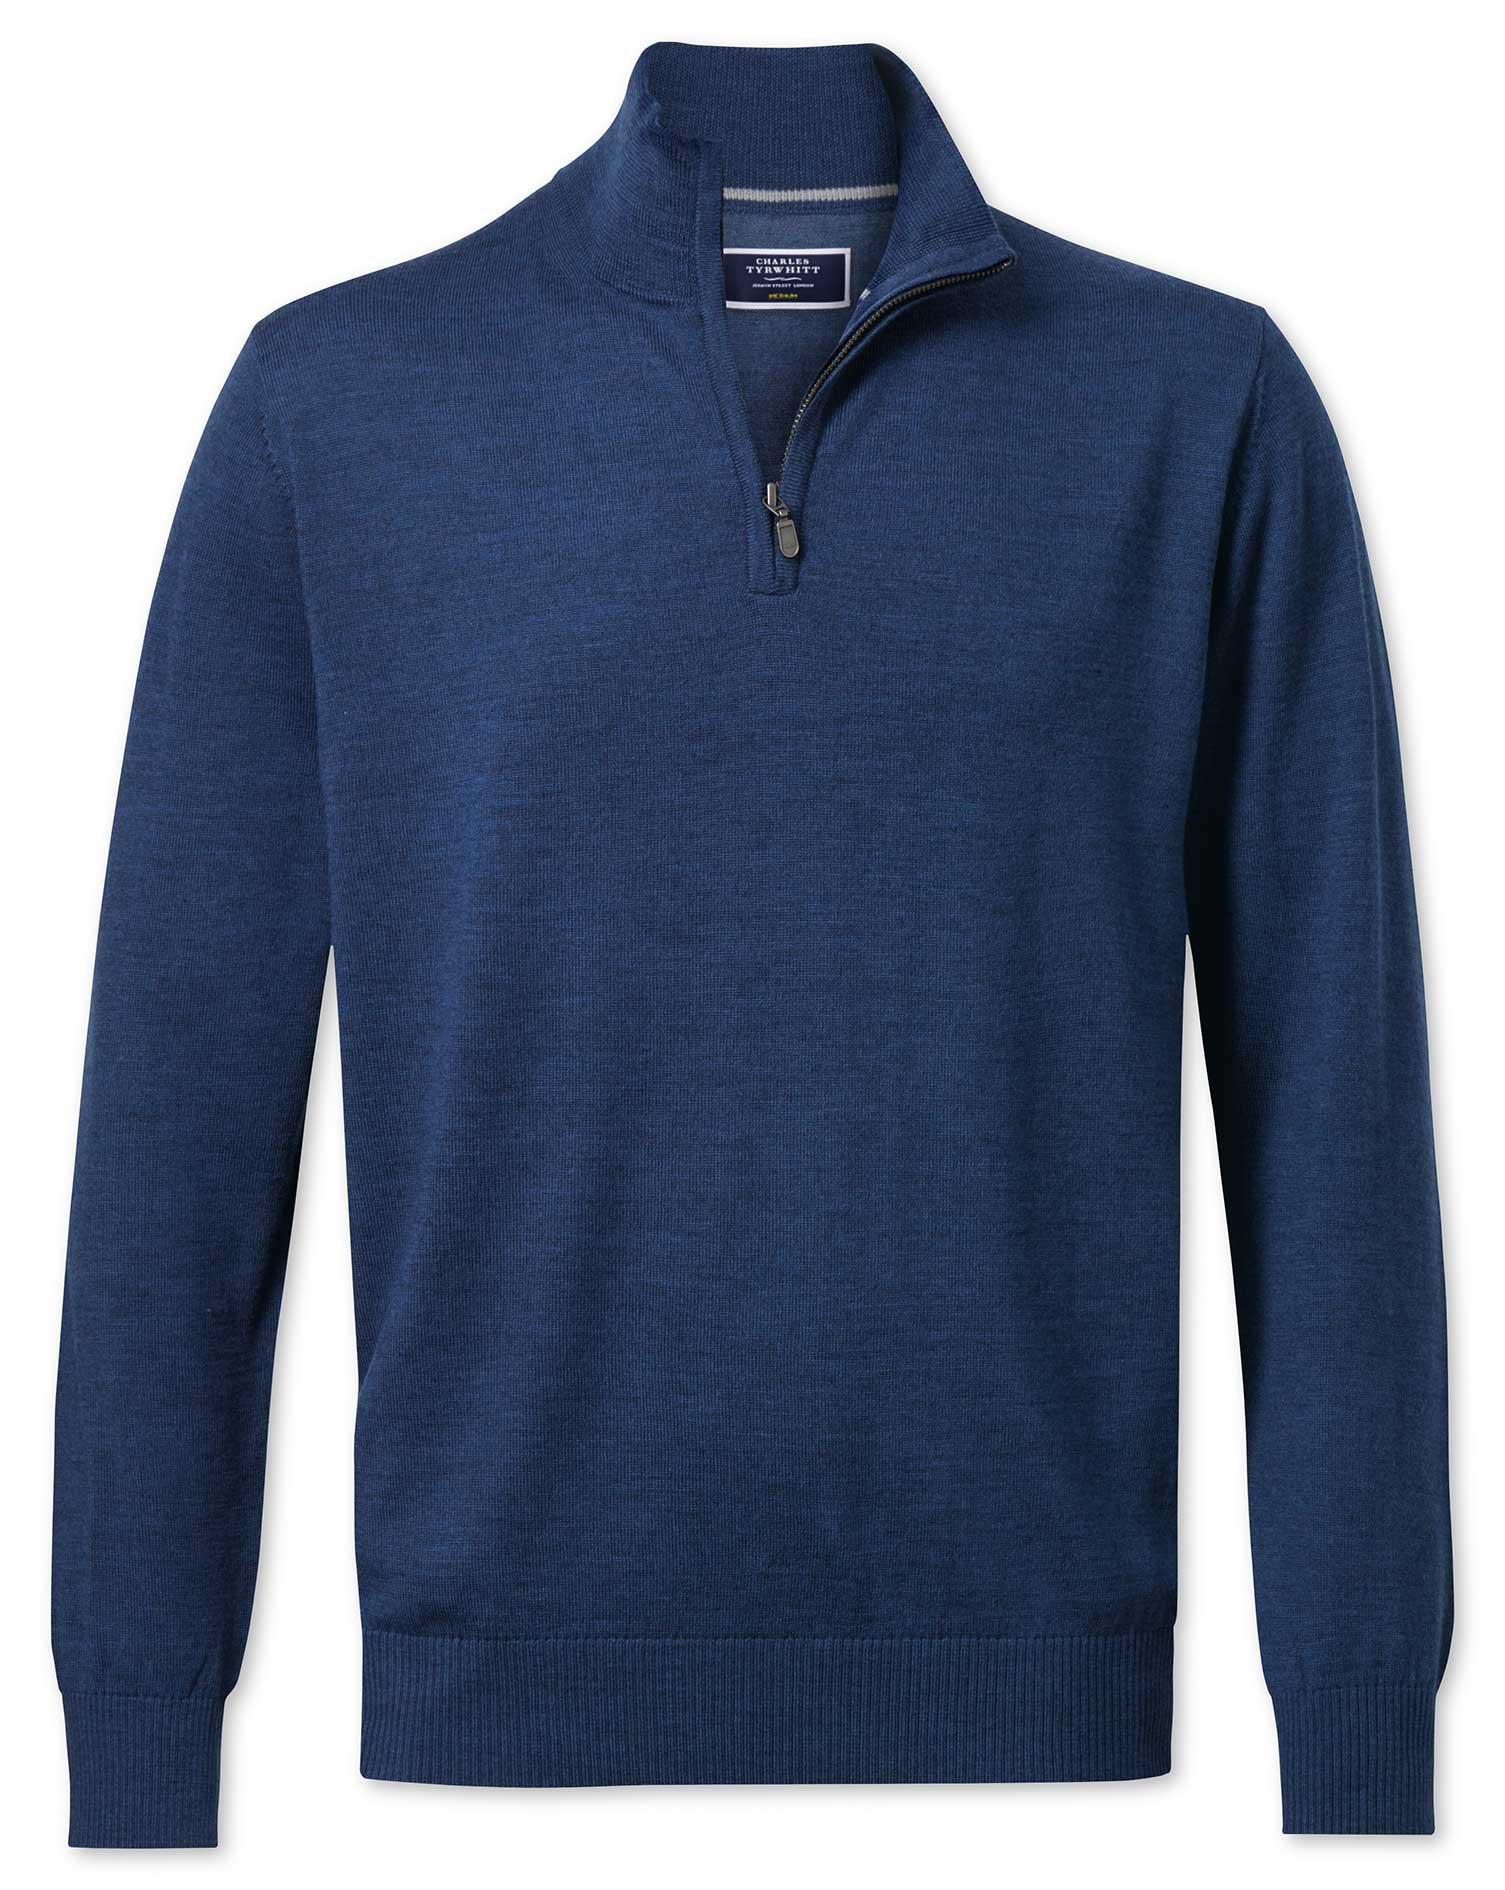 Mid Blue Merino Wool Zip Neck Jumper Size XS by Charles Tyrwhitt